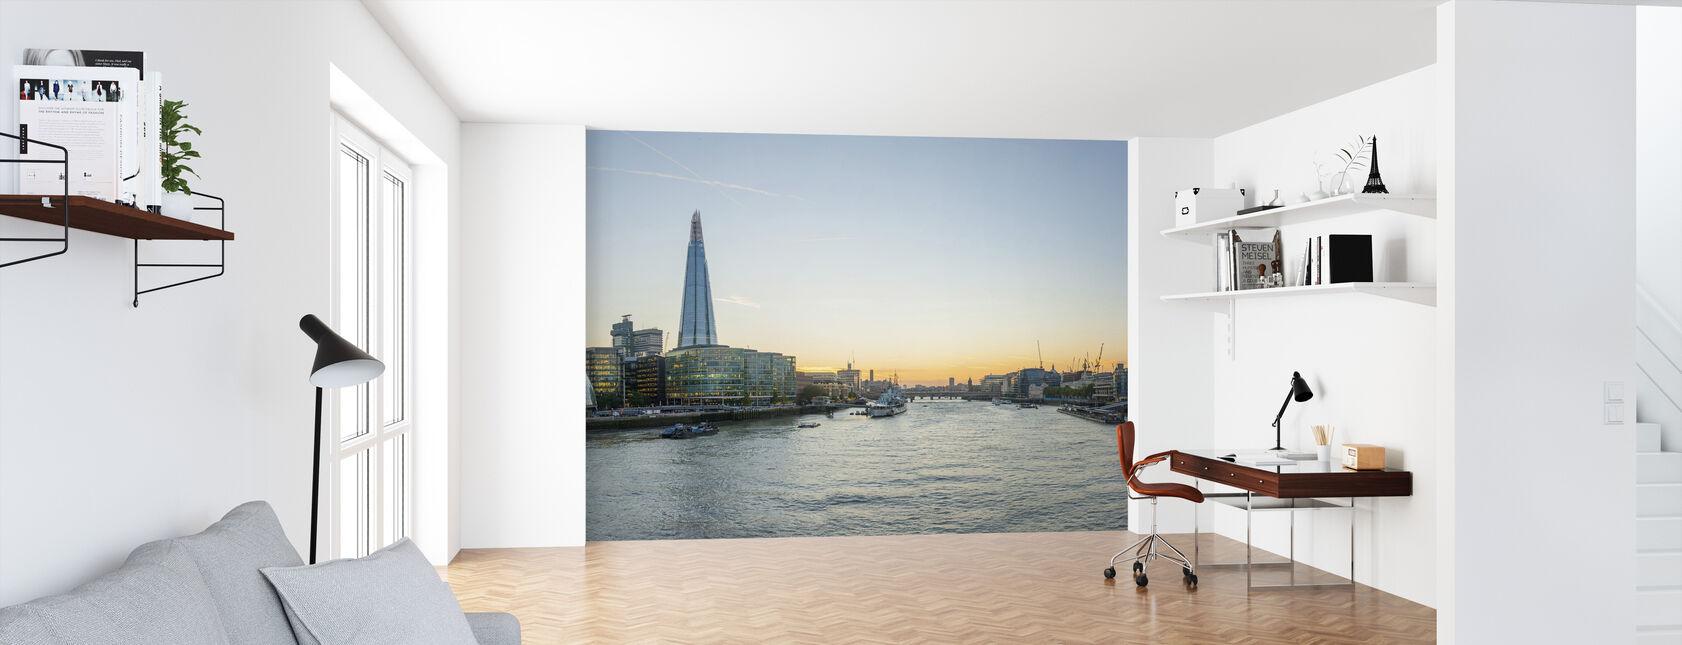 London Cityscape - Wallpaper - Office